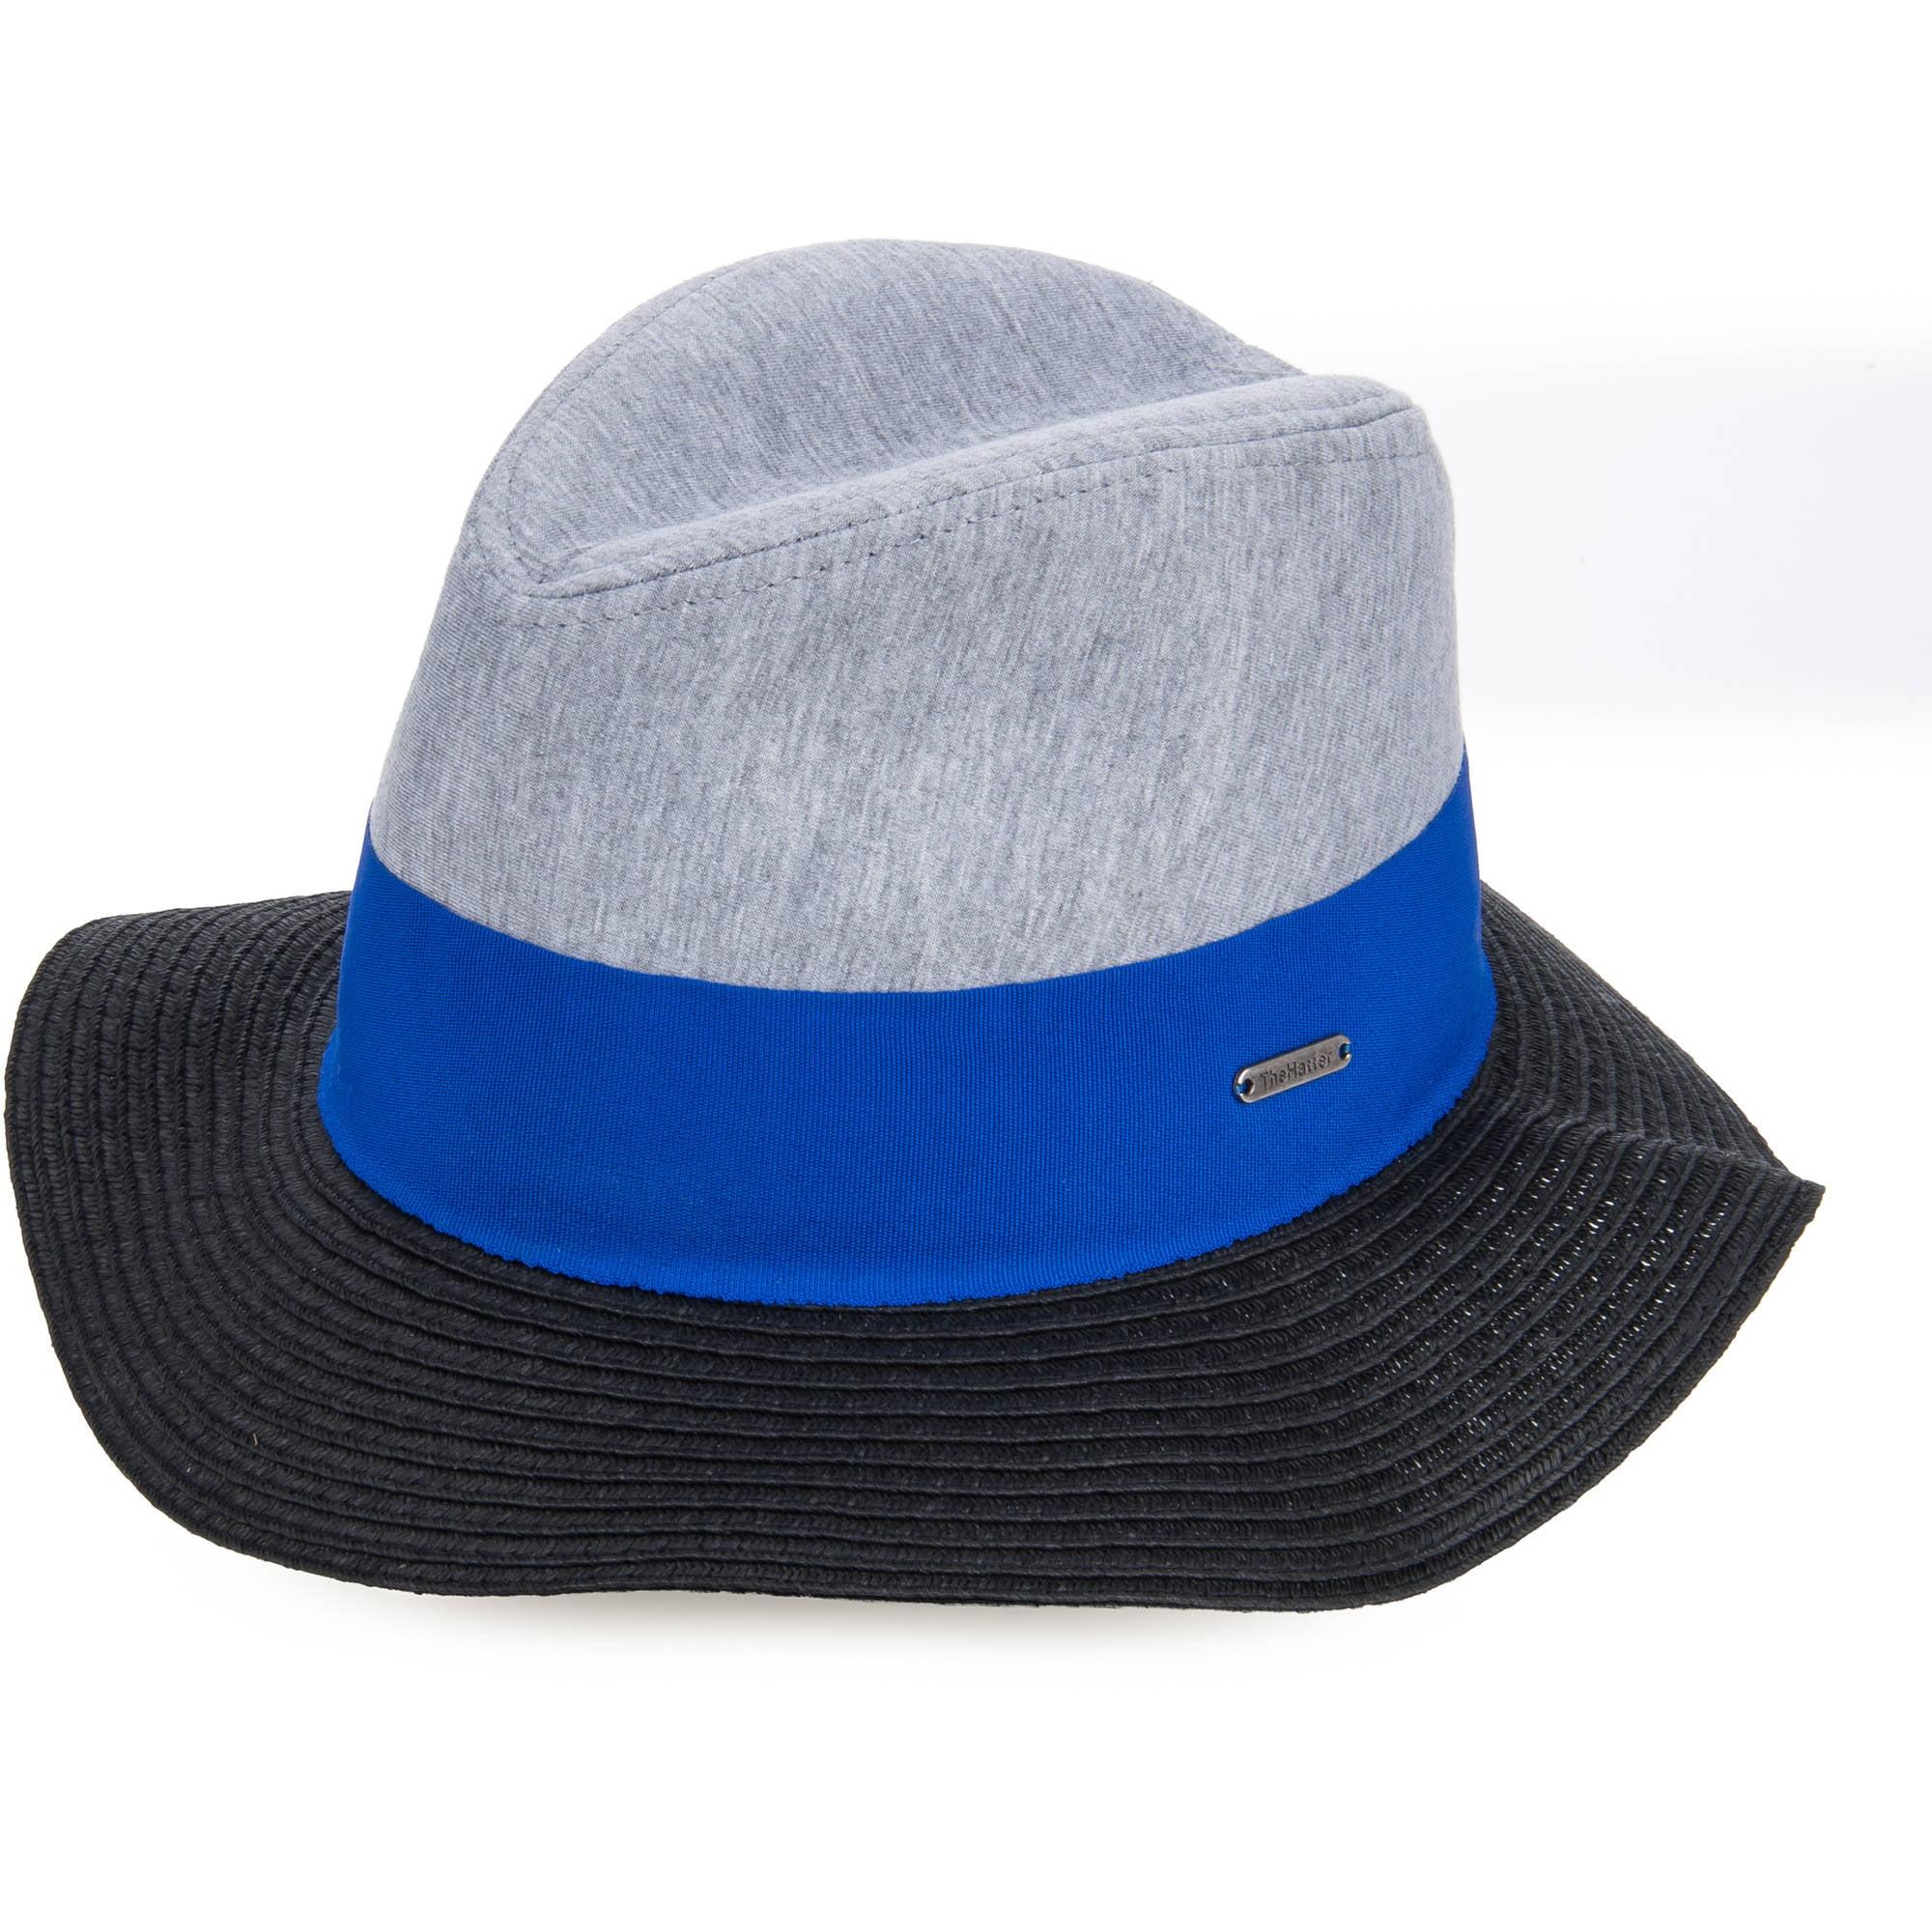 Image of AERUSI Casual Adventure Panama Hat